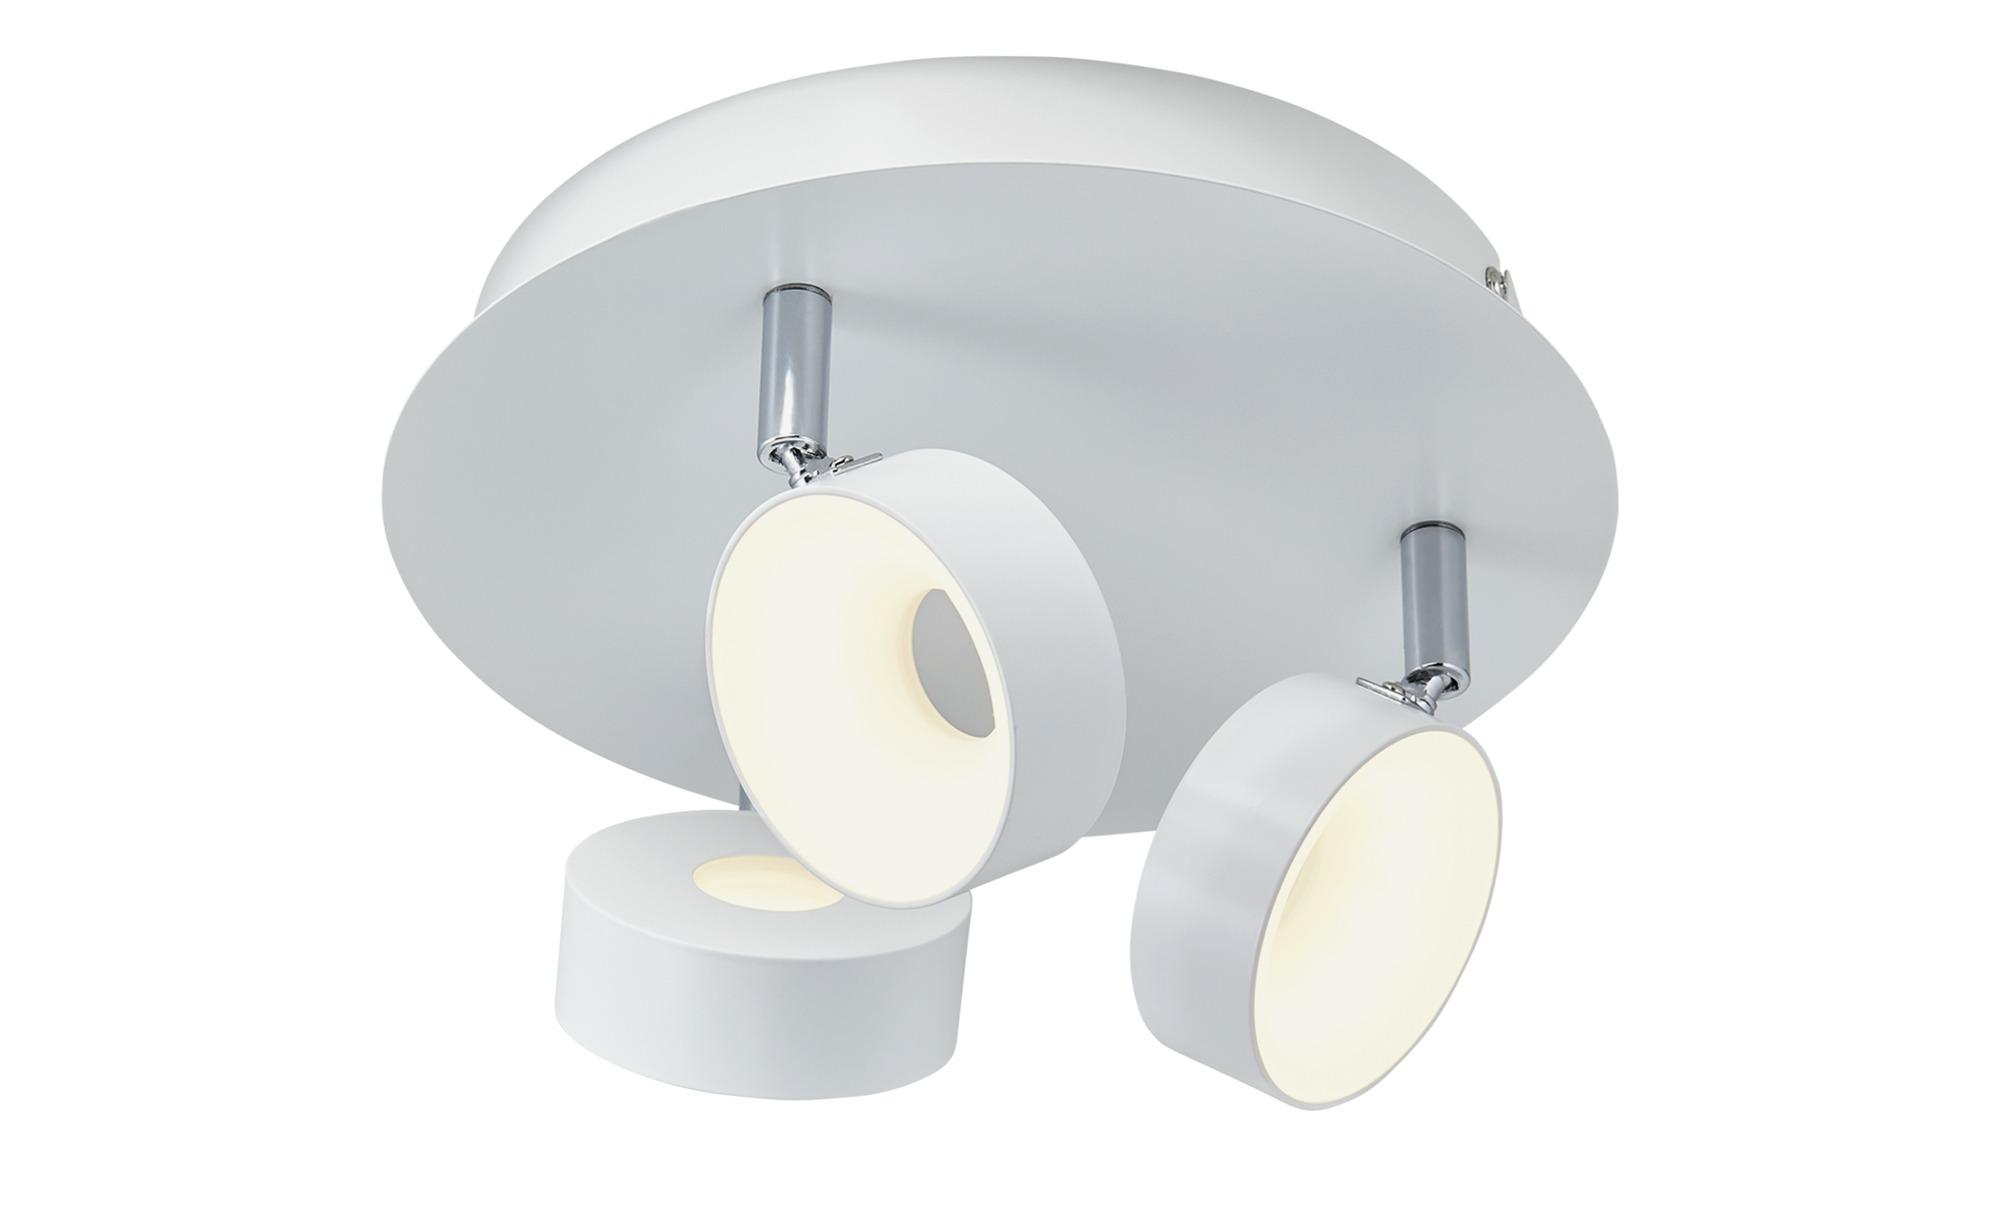 KHG LED-Spot, 3-flammig weiß ¦ weiß ¦ Maße (cm): H: 16 Ø: [29.0] Lampen & Leuchten > LED-Leuchten > LED-Strahler & Spots - Höffner